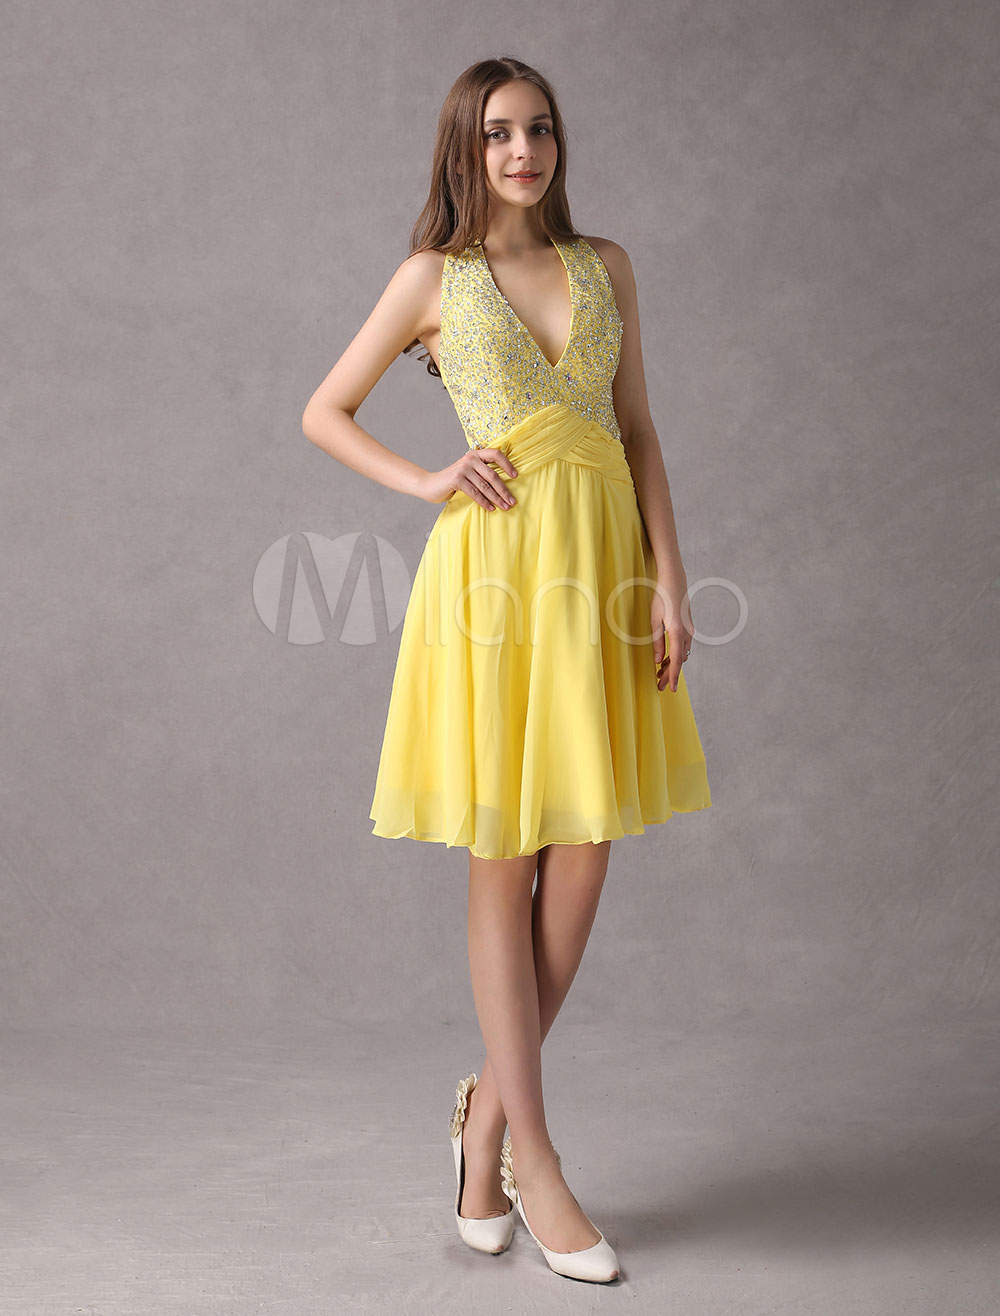 Yellow Homecoming Dress V Neck Halter Beading Chiffon Short Prom ...